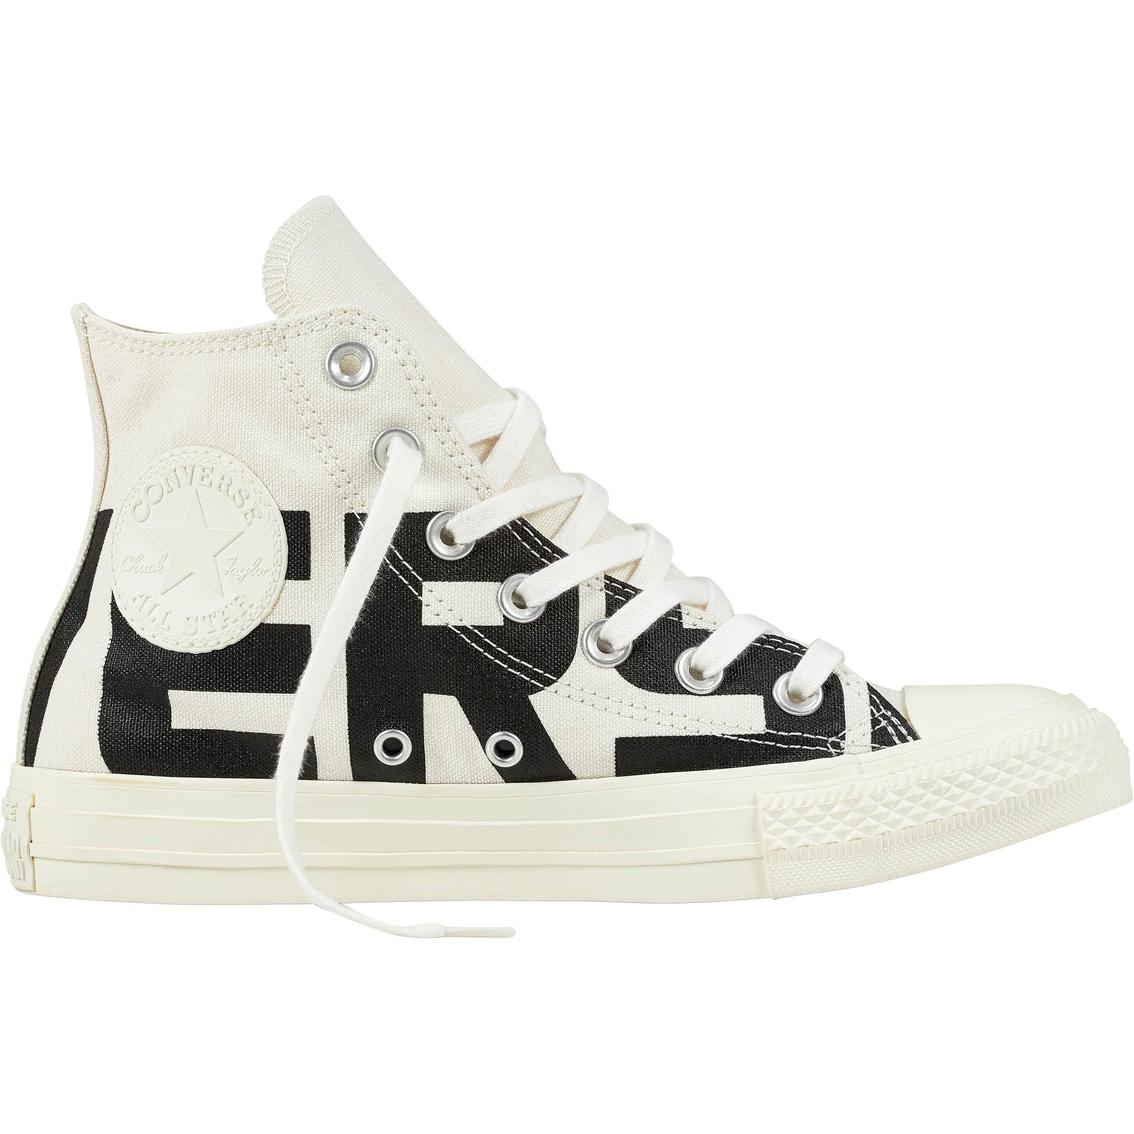 e4175c29ed1c Converse Chuck Taylor All Star Men s Hi Wordmark Athletic Shoes ...